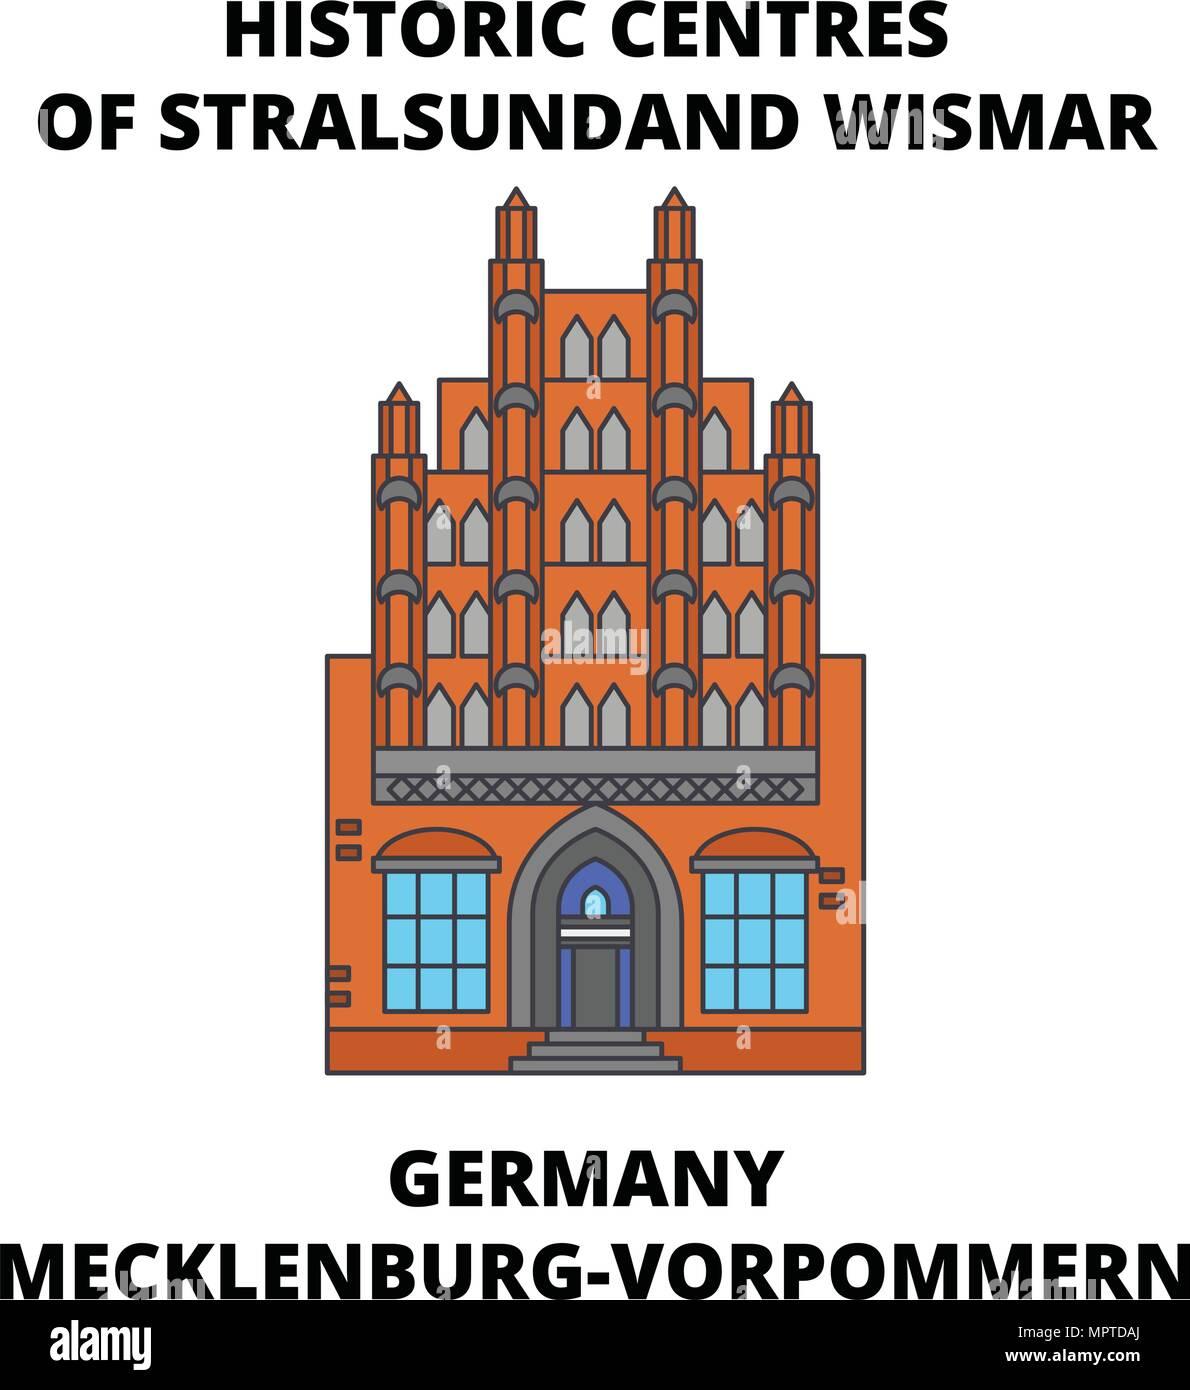 Germany, Mecklenburg-Vorpommern, Historic Centres Of Stralsund and Wismar line icon concept. Germany, Mecklenburg-Vorpommern, Stralsund and Wismar flat vector sign, symbol, illustration. - Stock Vector